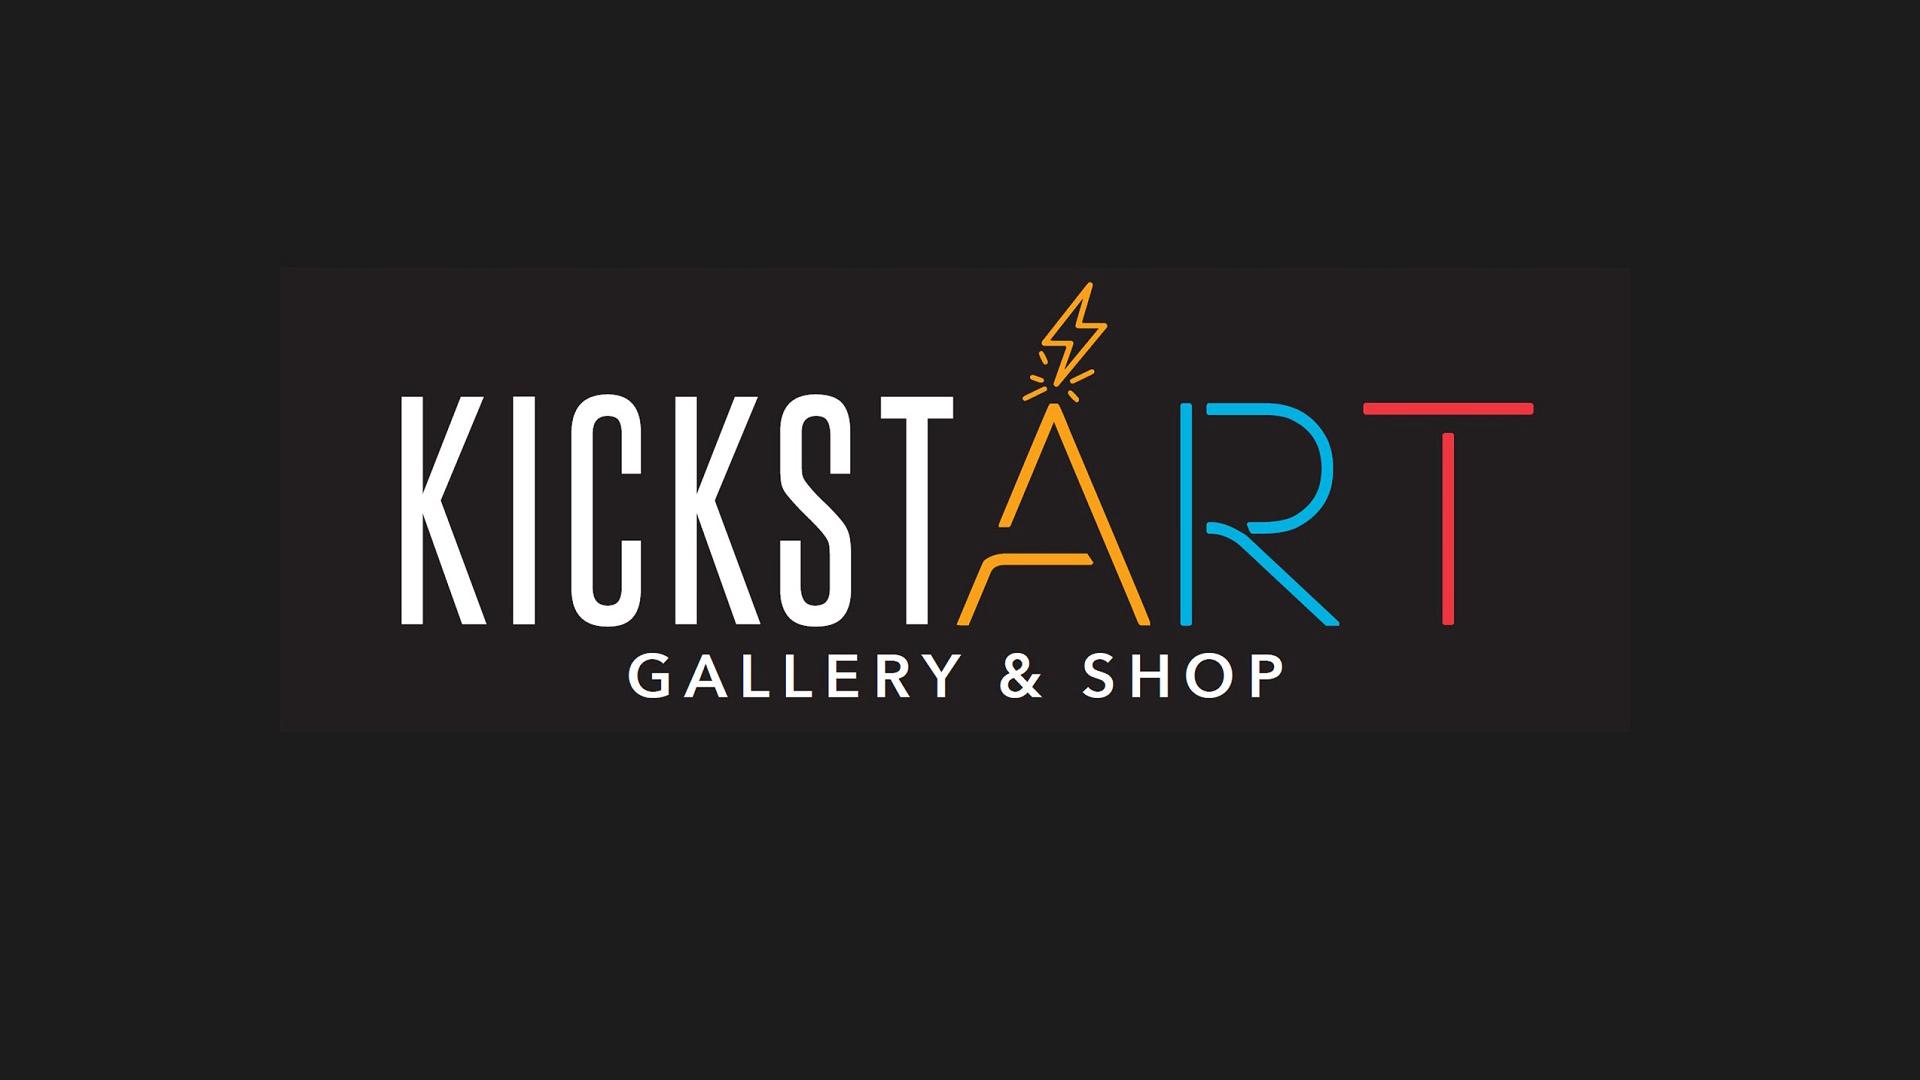 KickstART Gallery